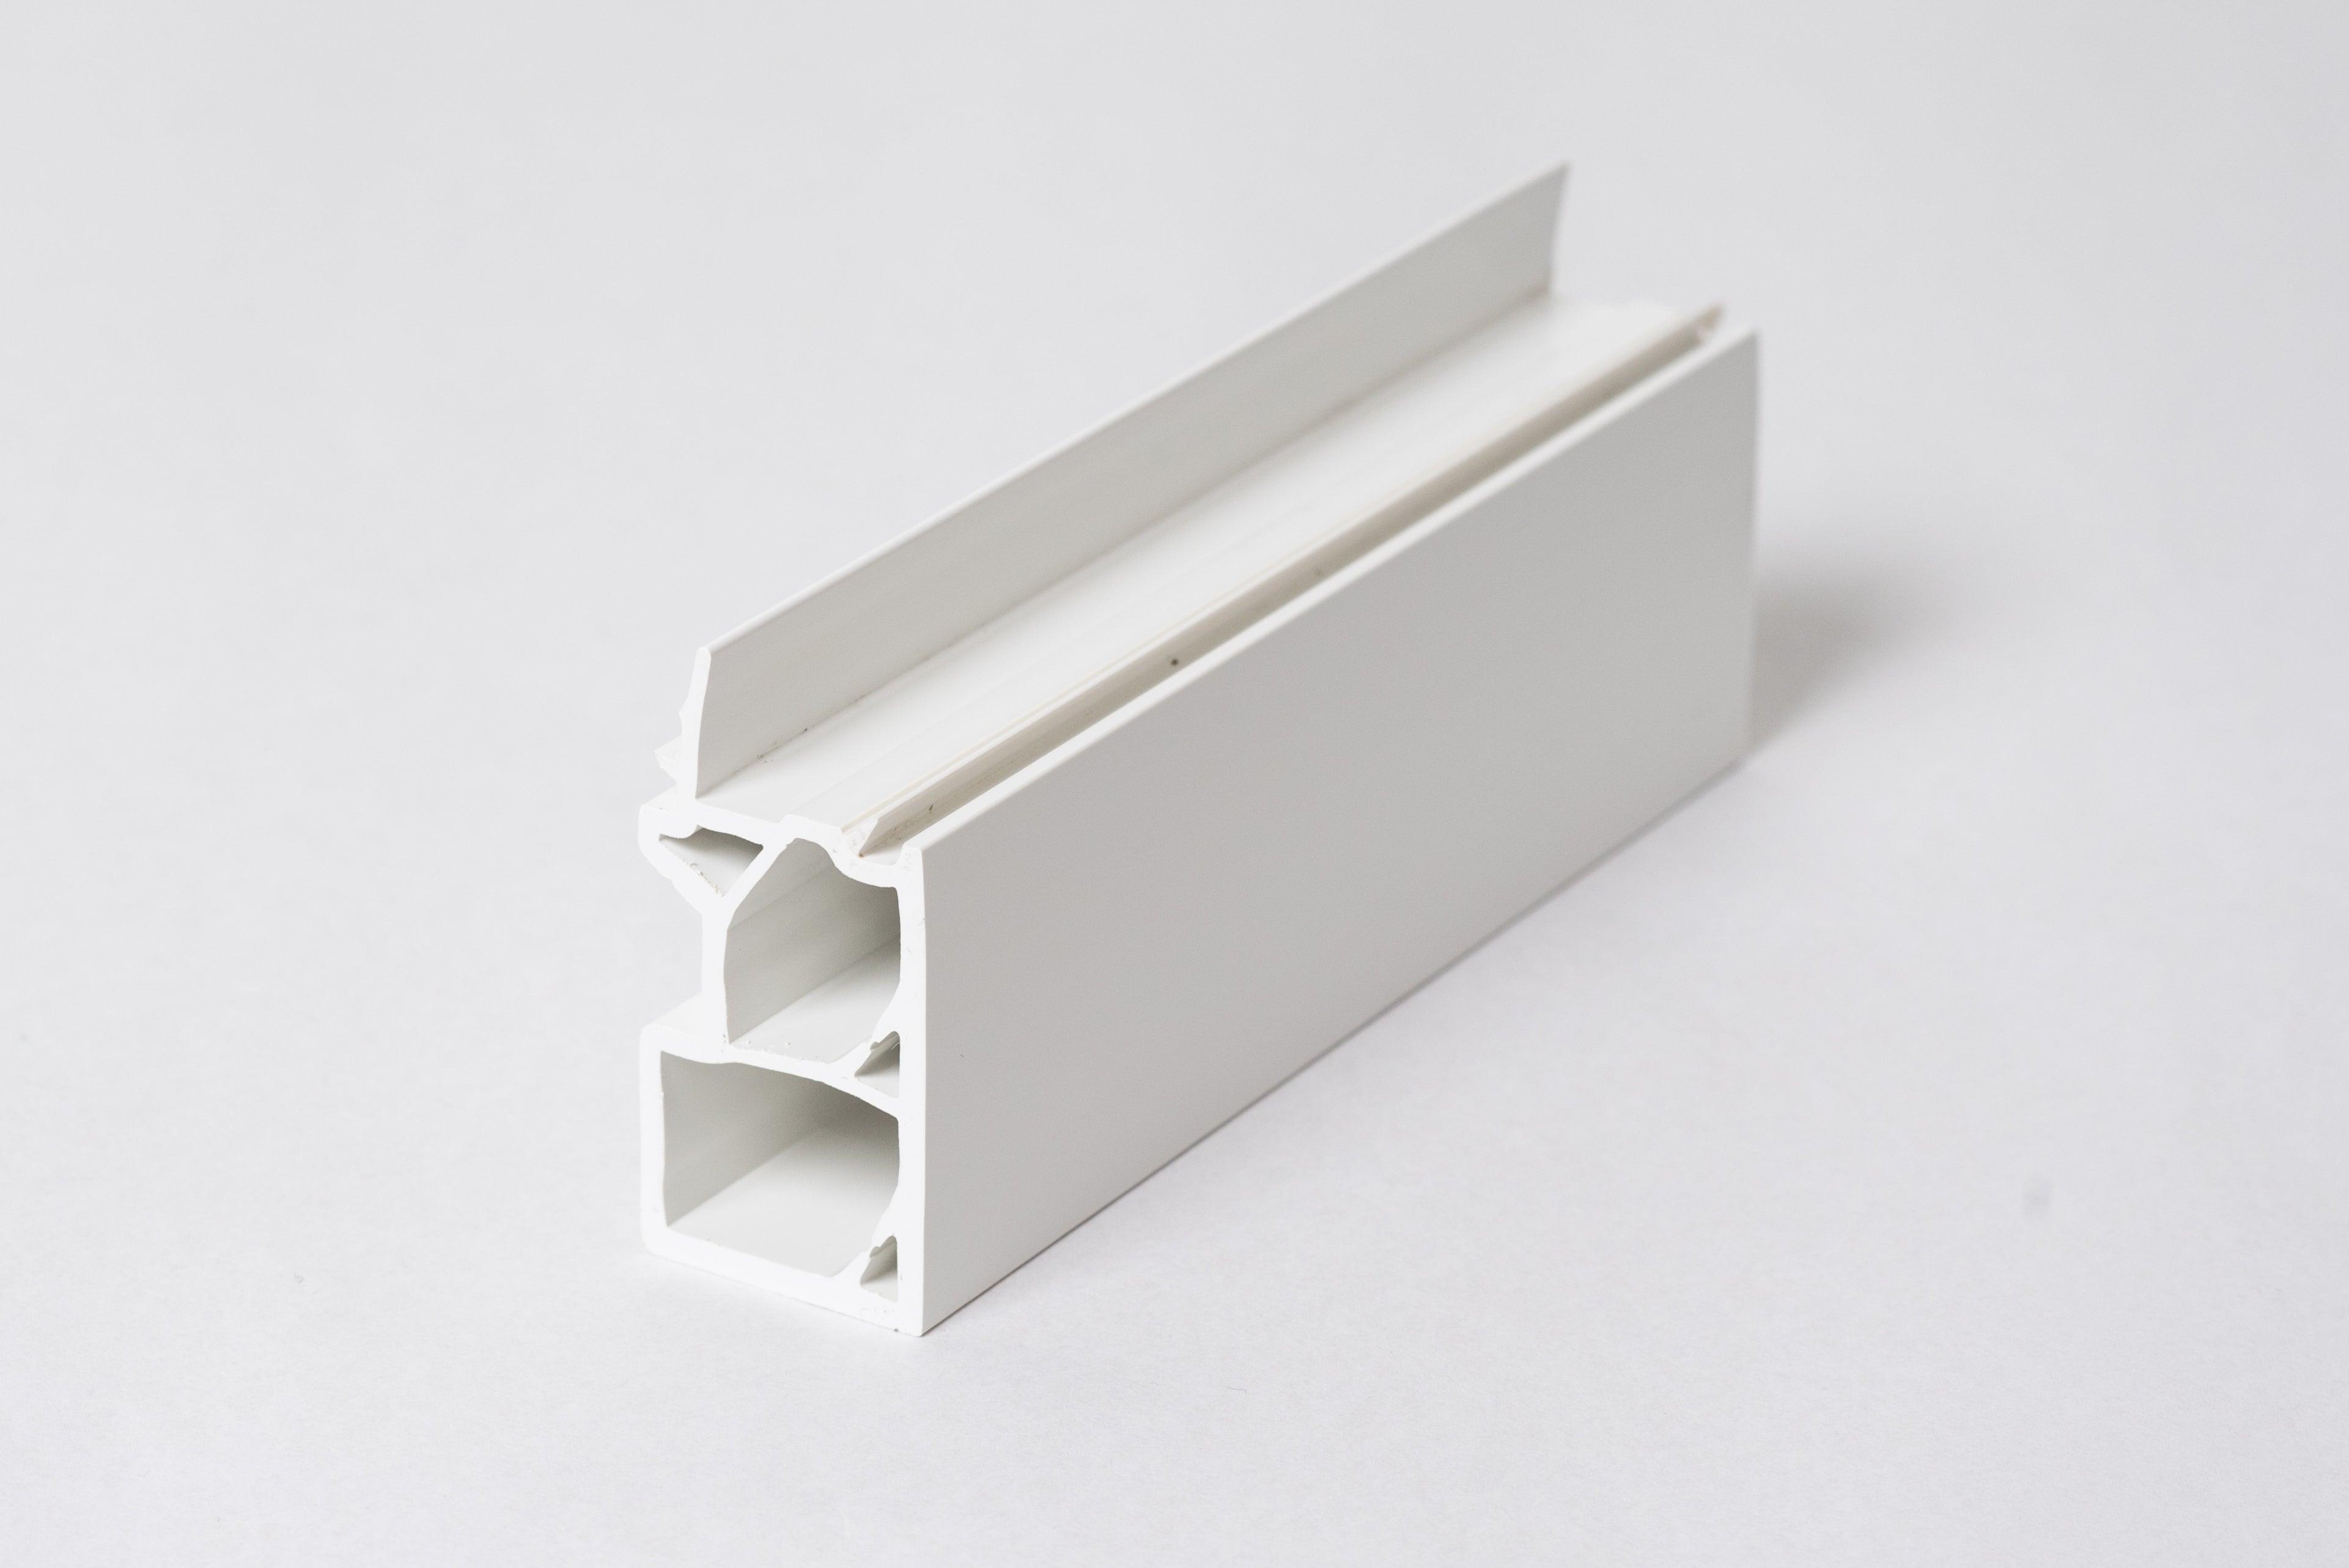 Tapee Pvc 140 Longueur 1 50m Blanc Leroy Merlin